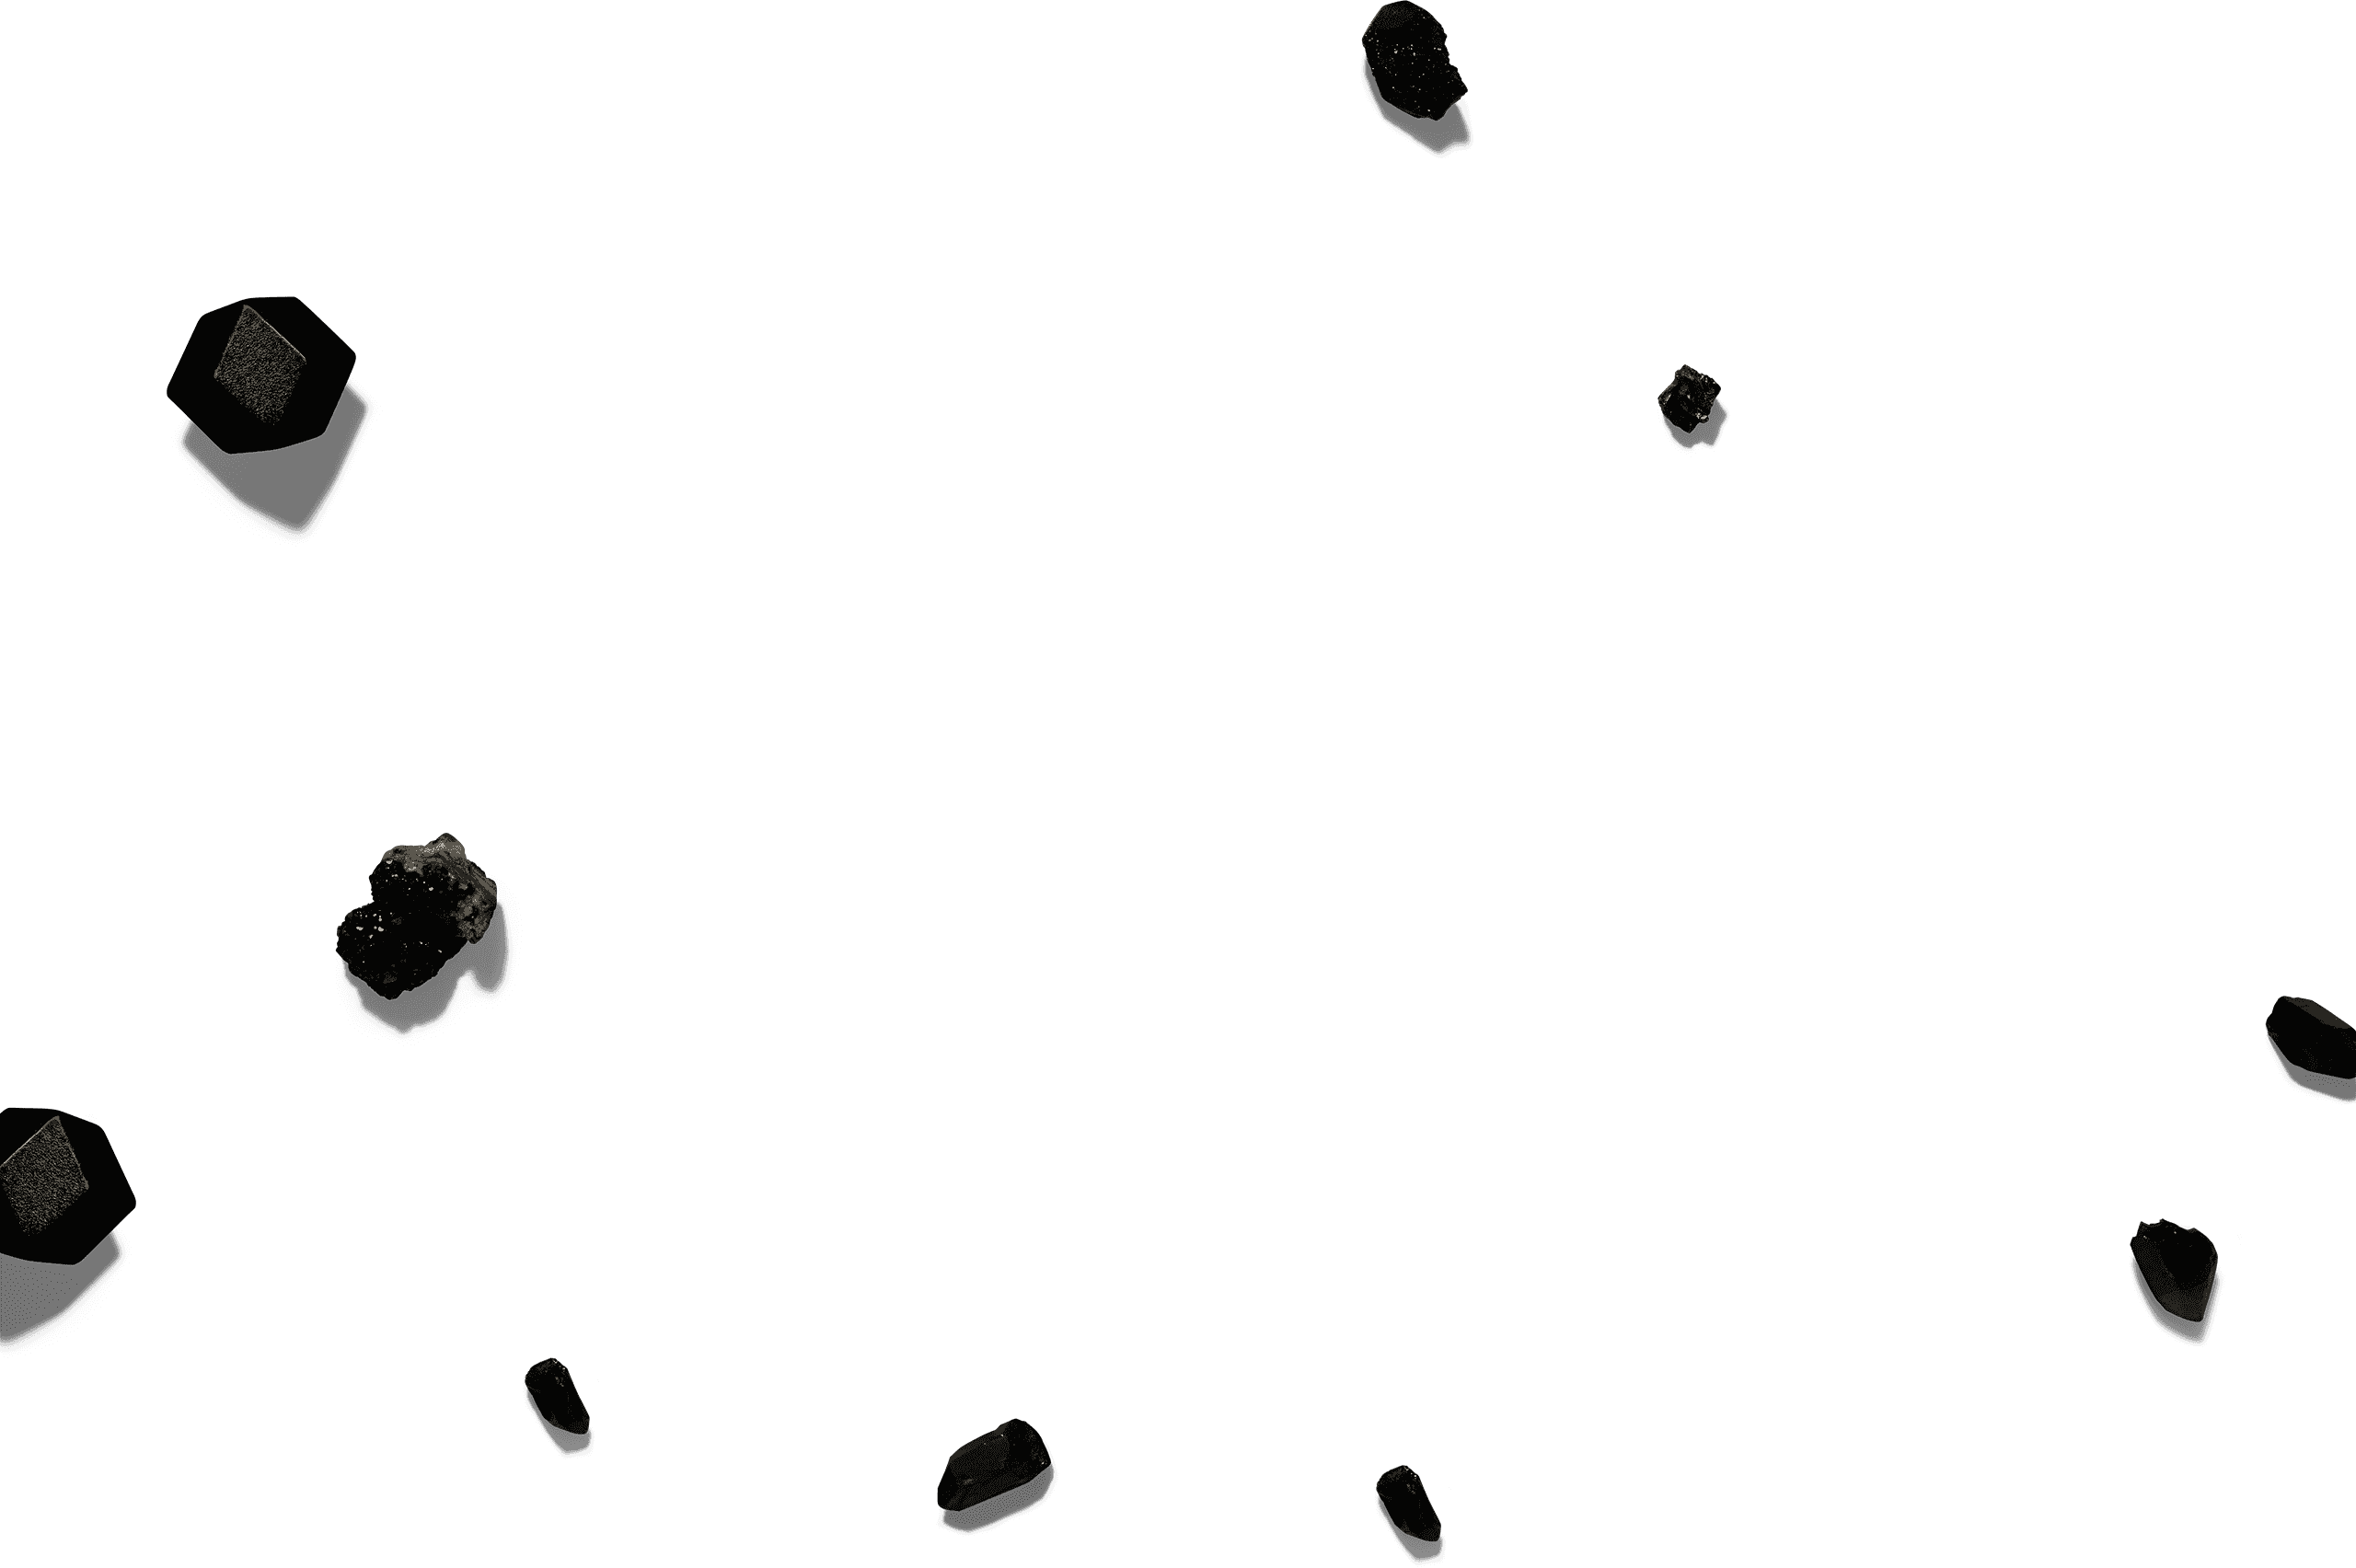 Luna_Poster_for-web-scroll_02-compressor